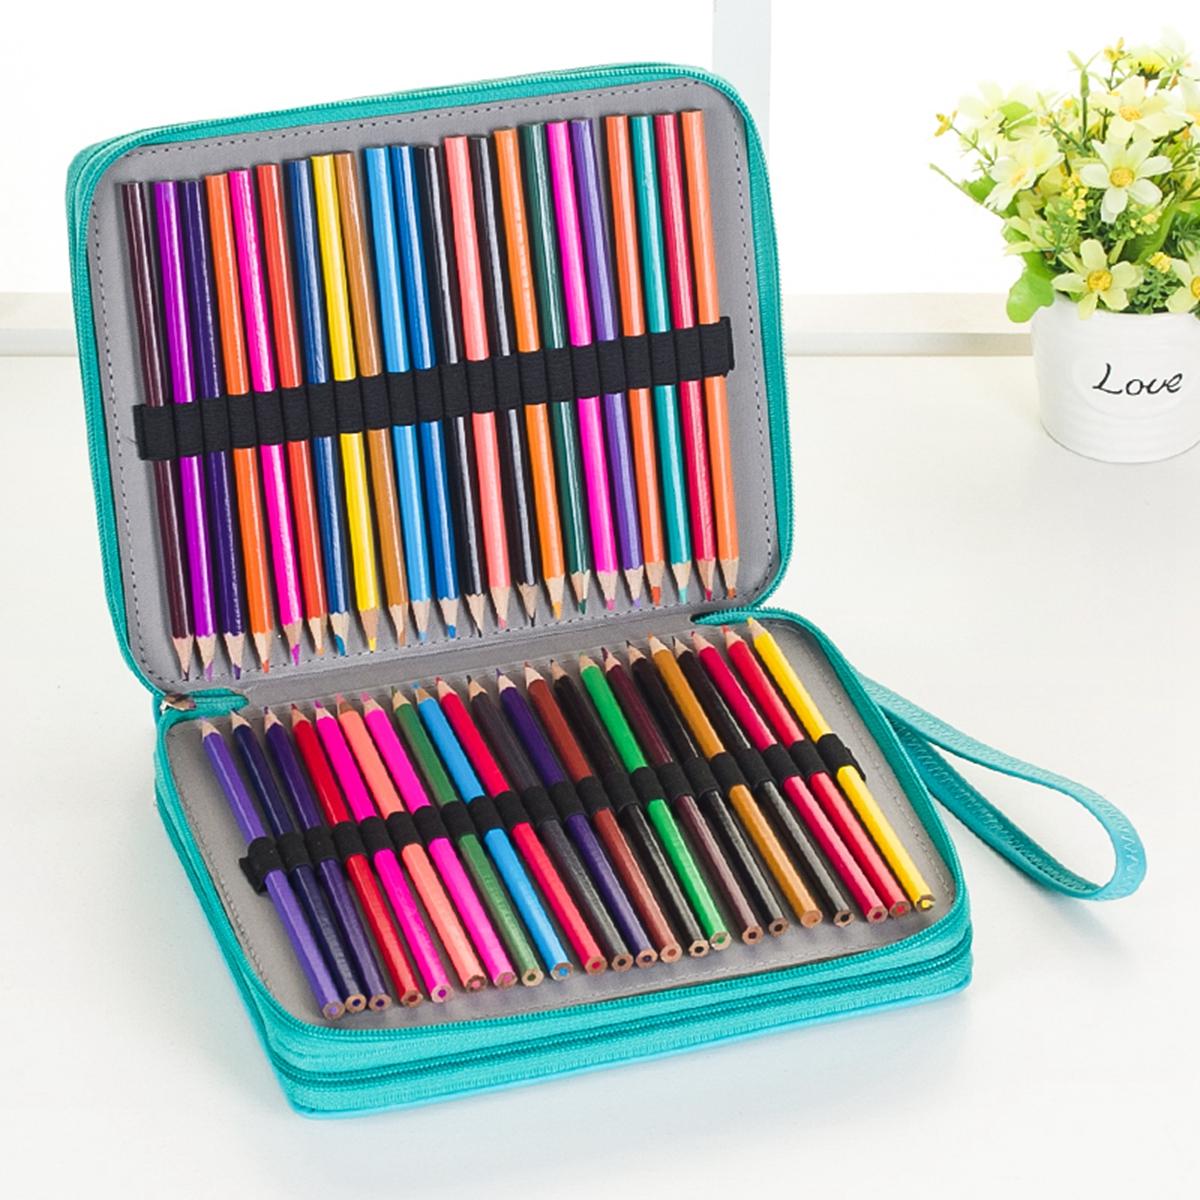 120 Slots Pencil Case Cosmetic Makeup Bag Storage Trave